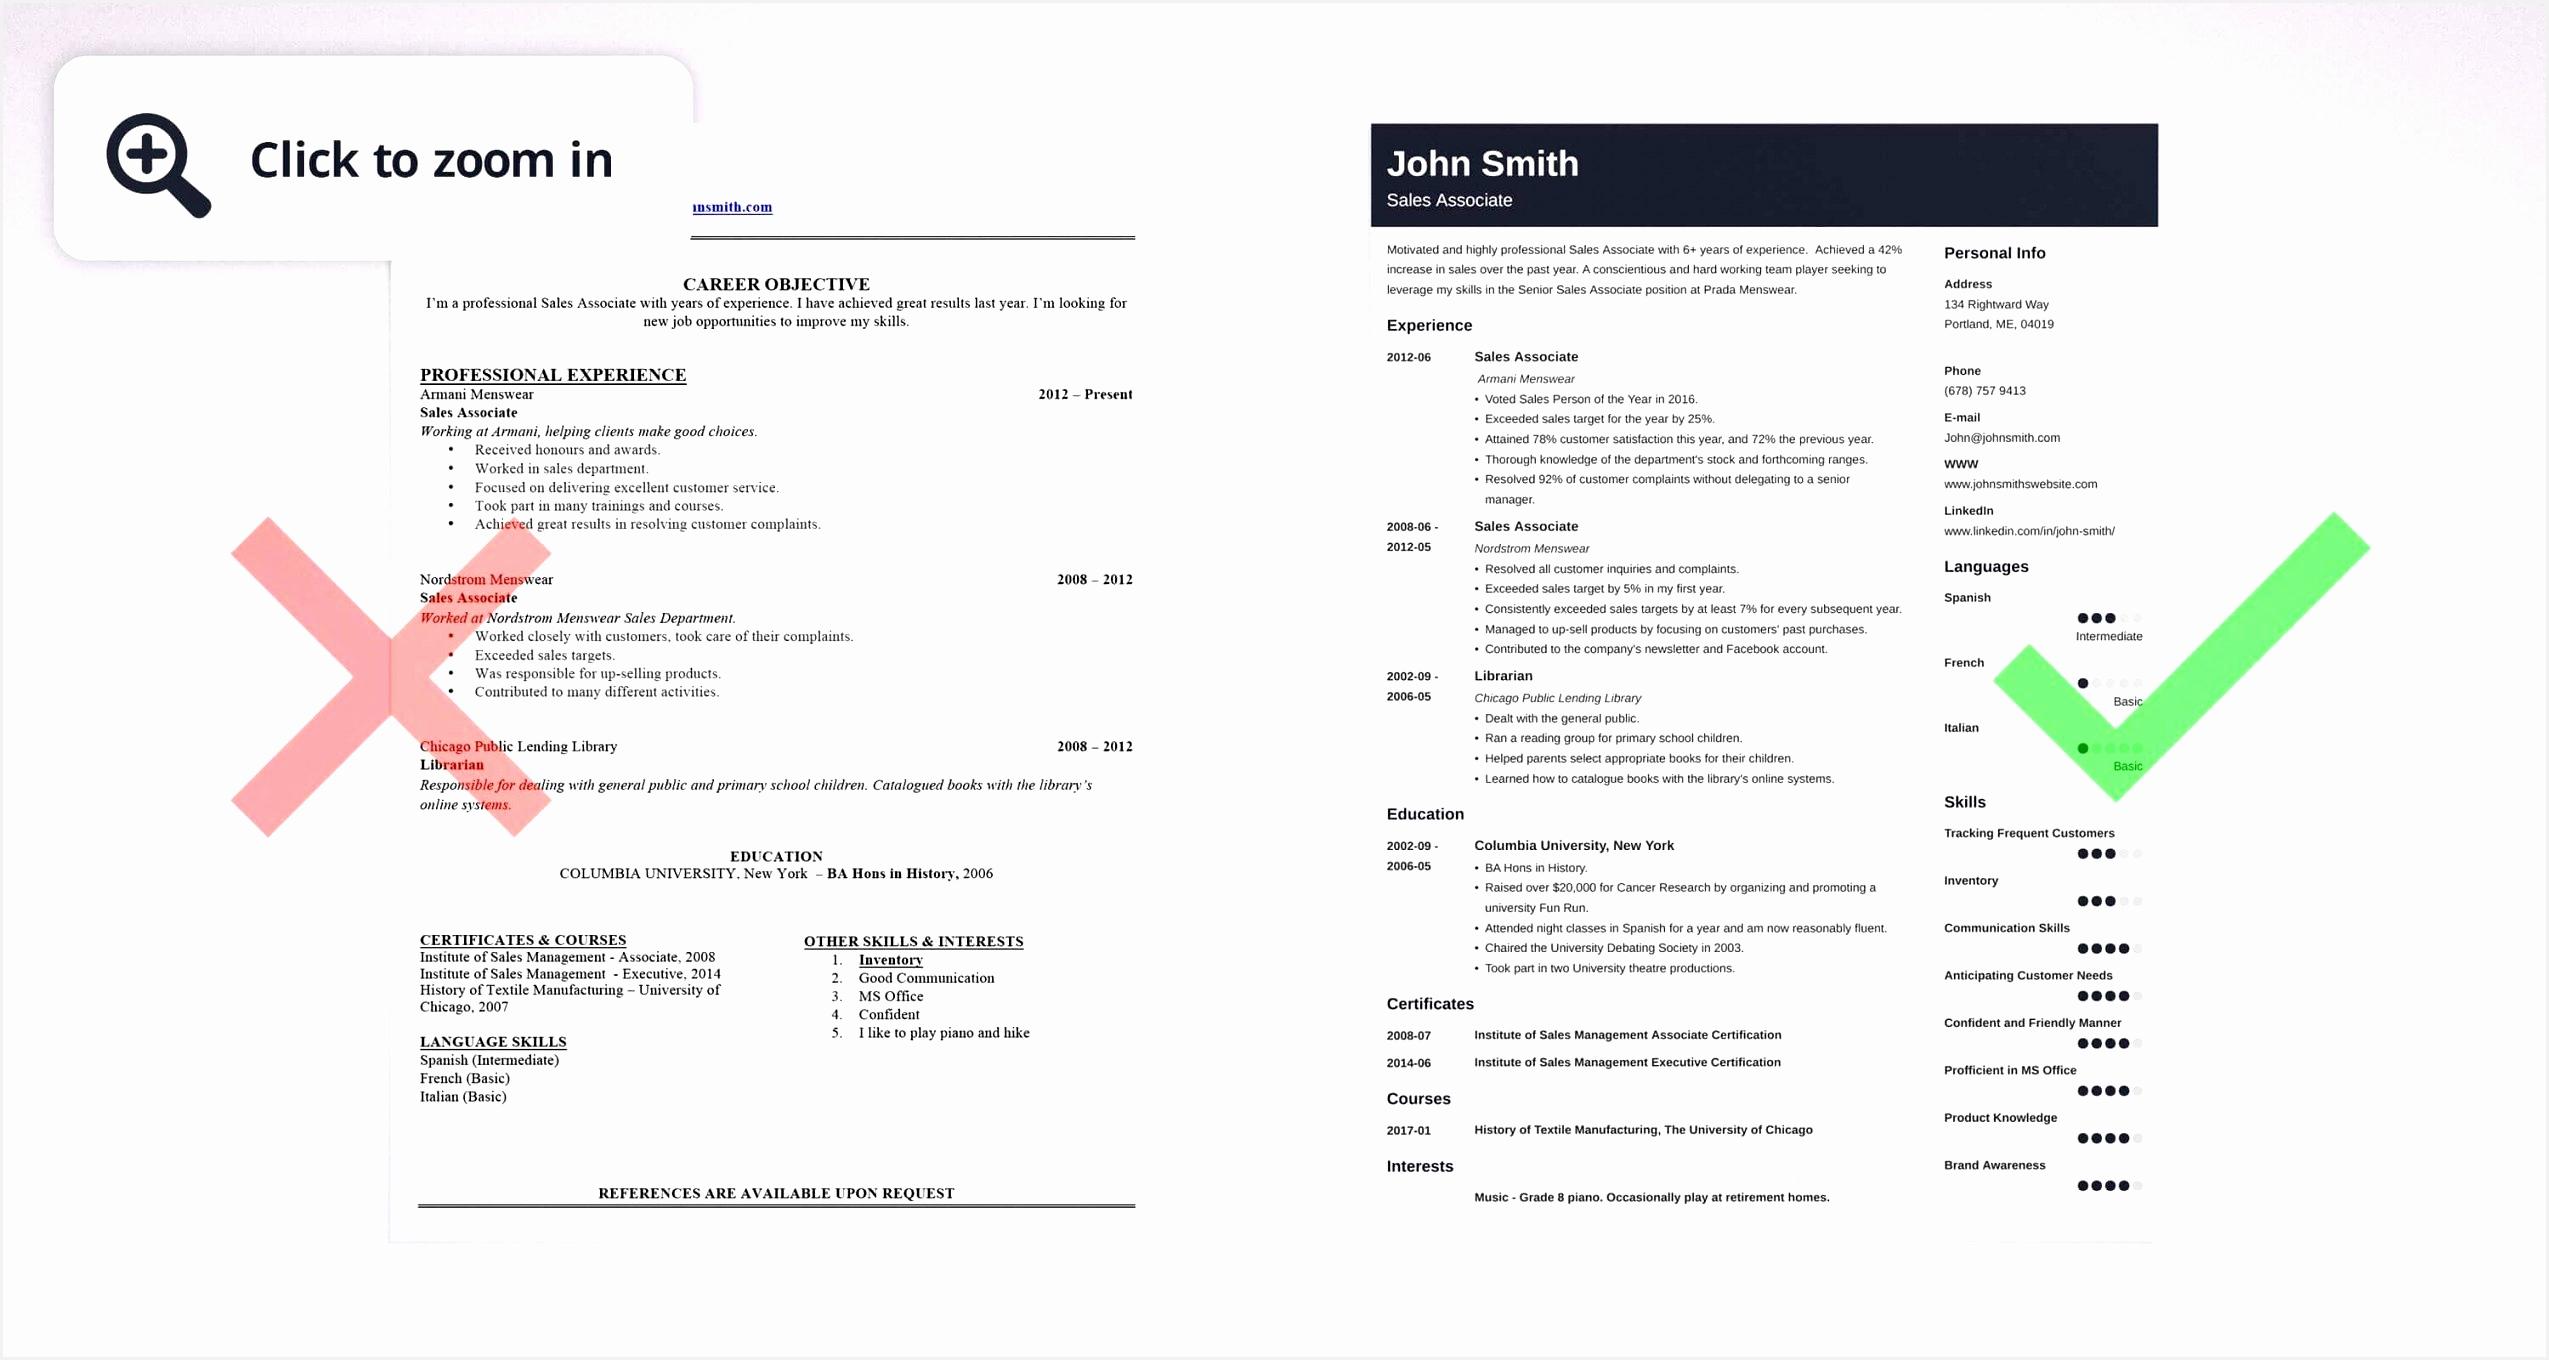 Free Blank Resume Templates Elegant A Resume for A Job Lovely Fresh Blank Resume format Resume13602549